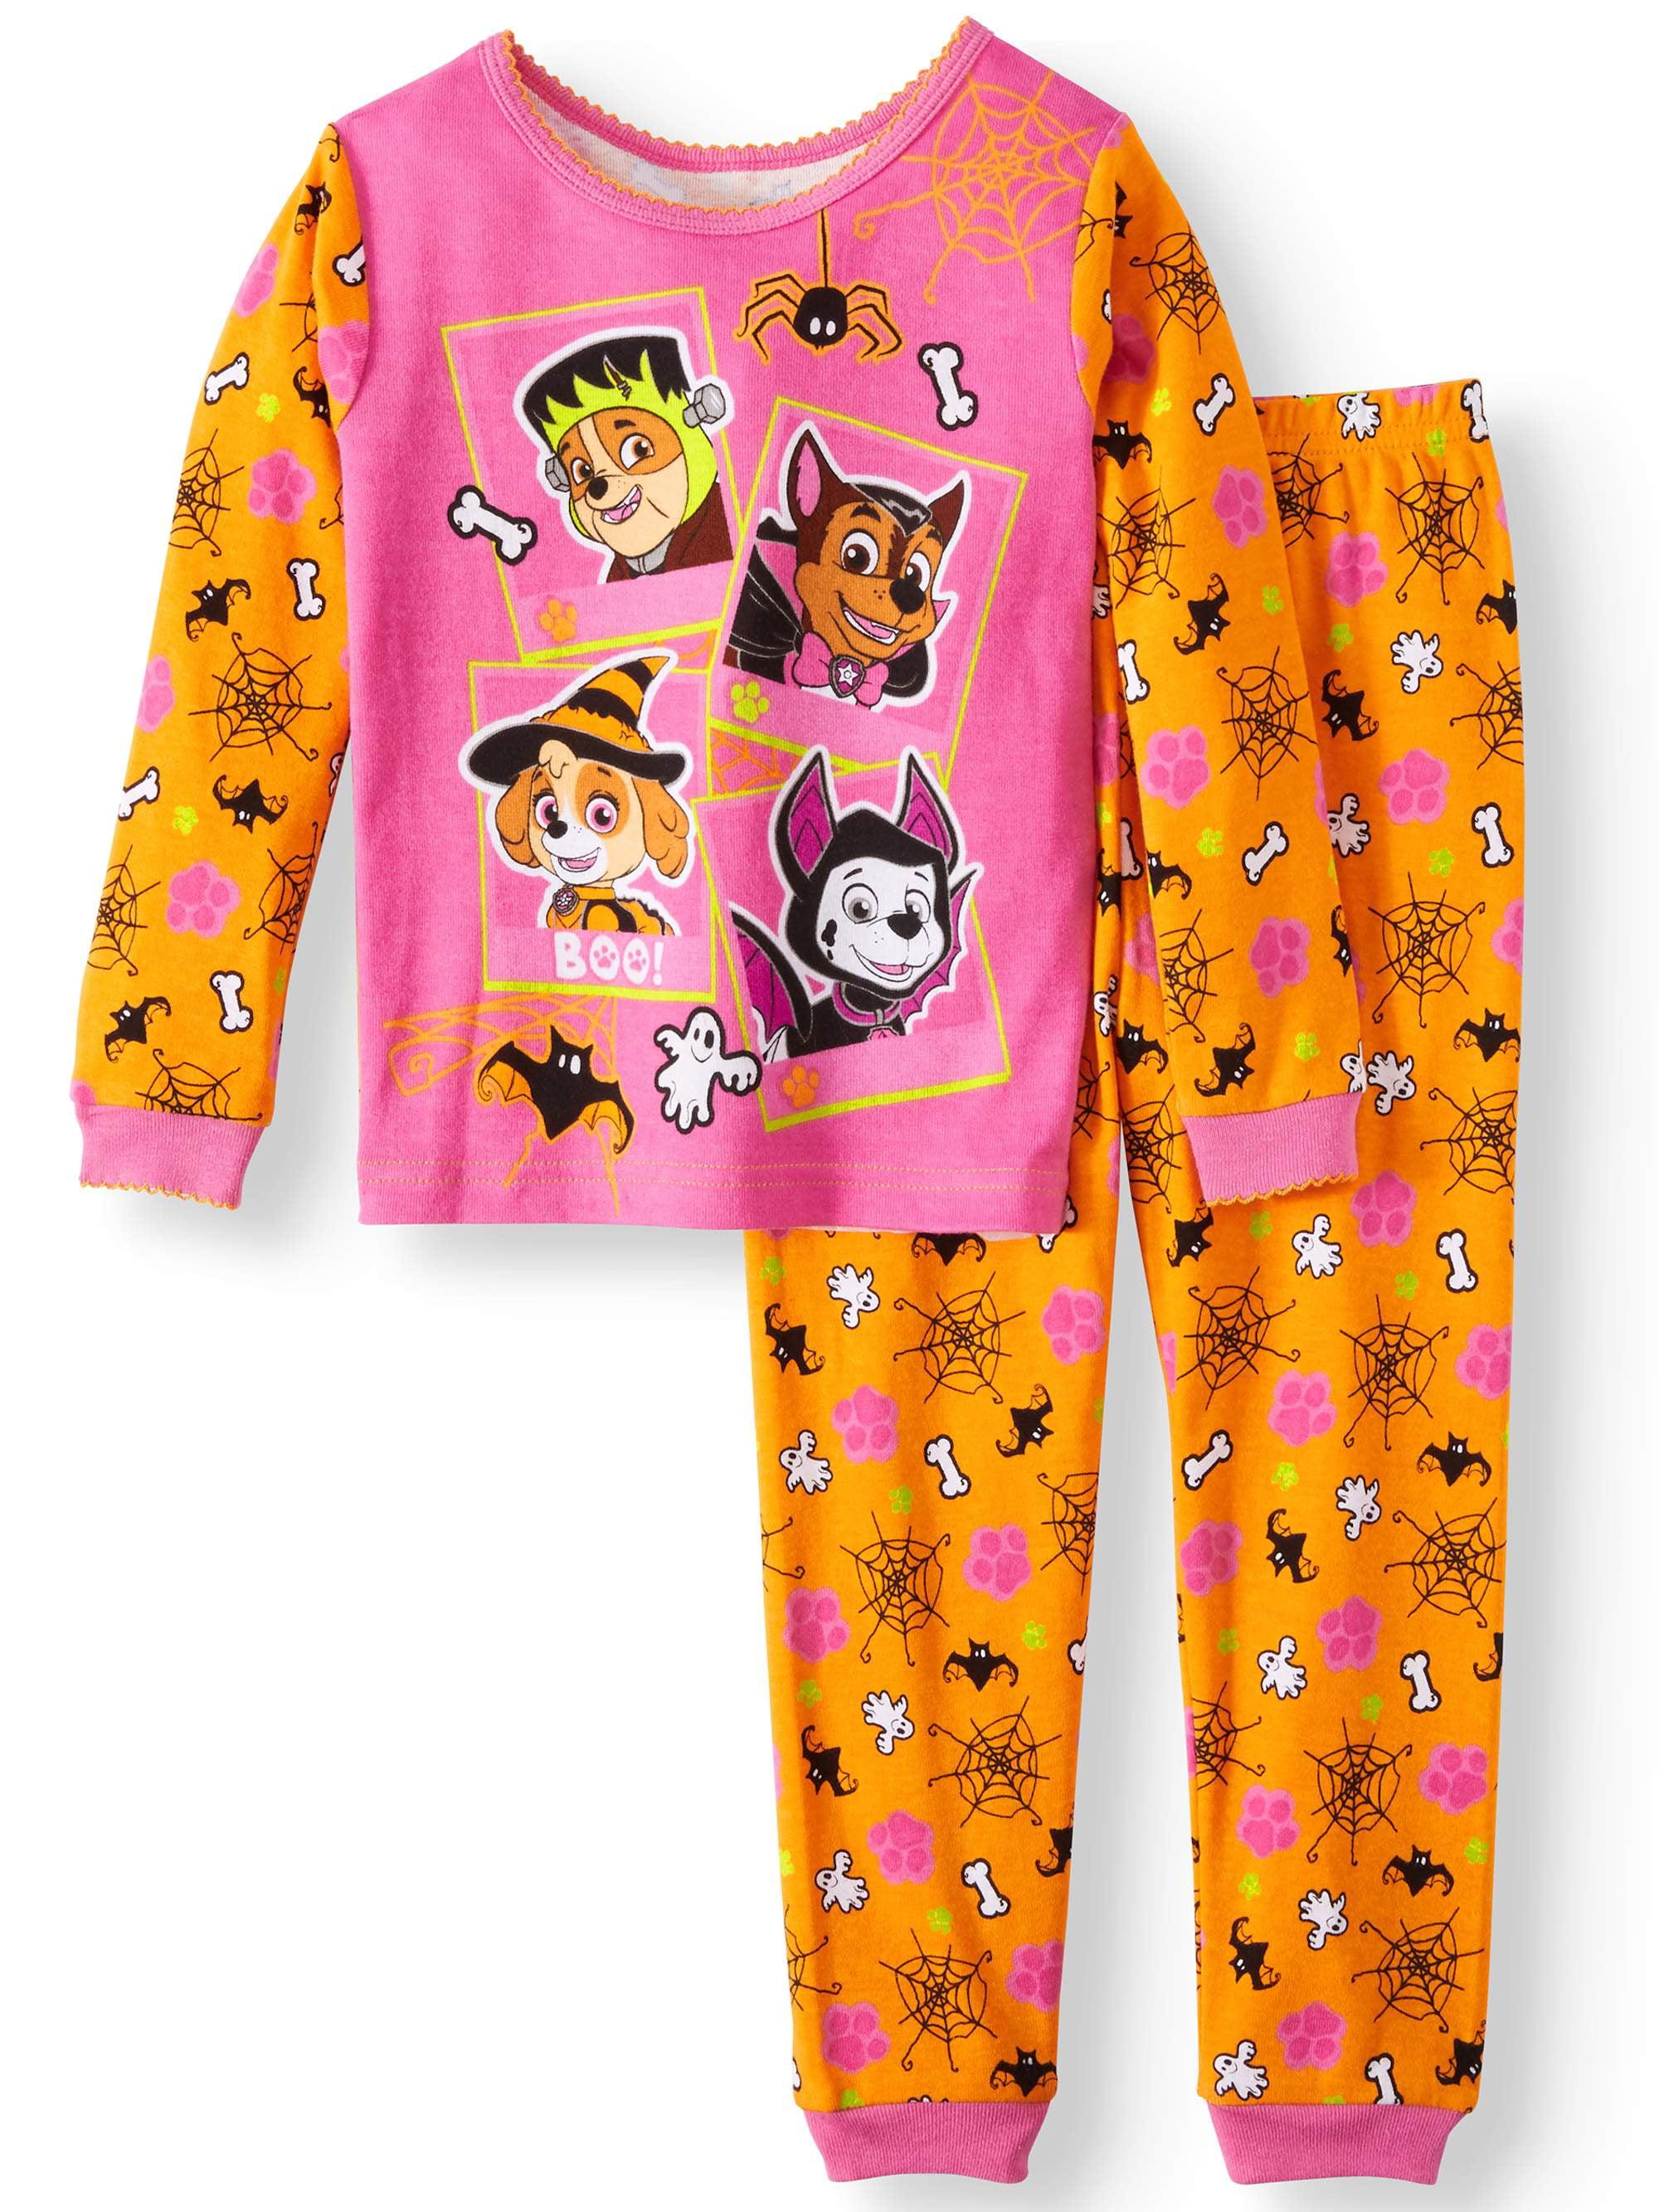 Halloween Glow-in-the-Dark Cotton Tight Fit Pajamas, 2-piece Set (Toddler Girls)